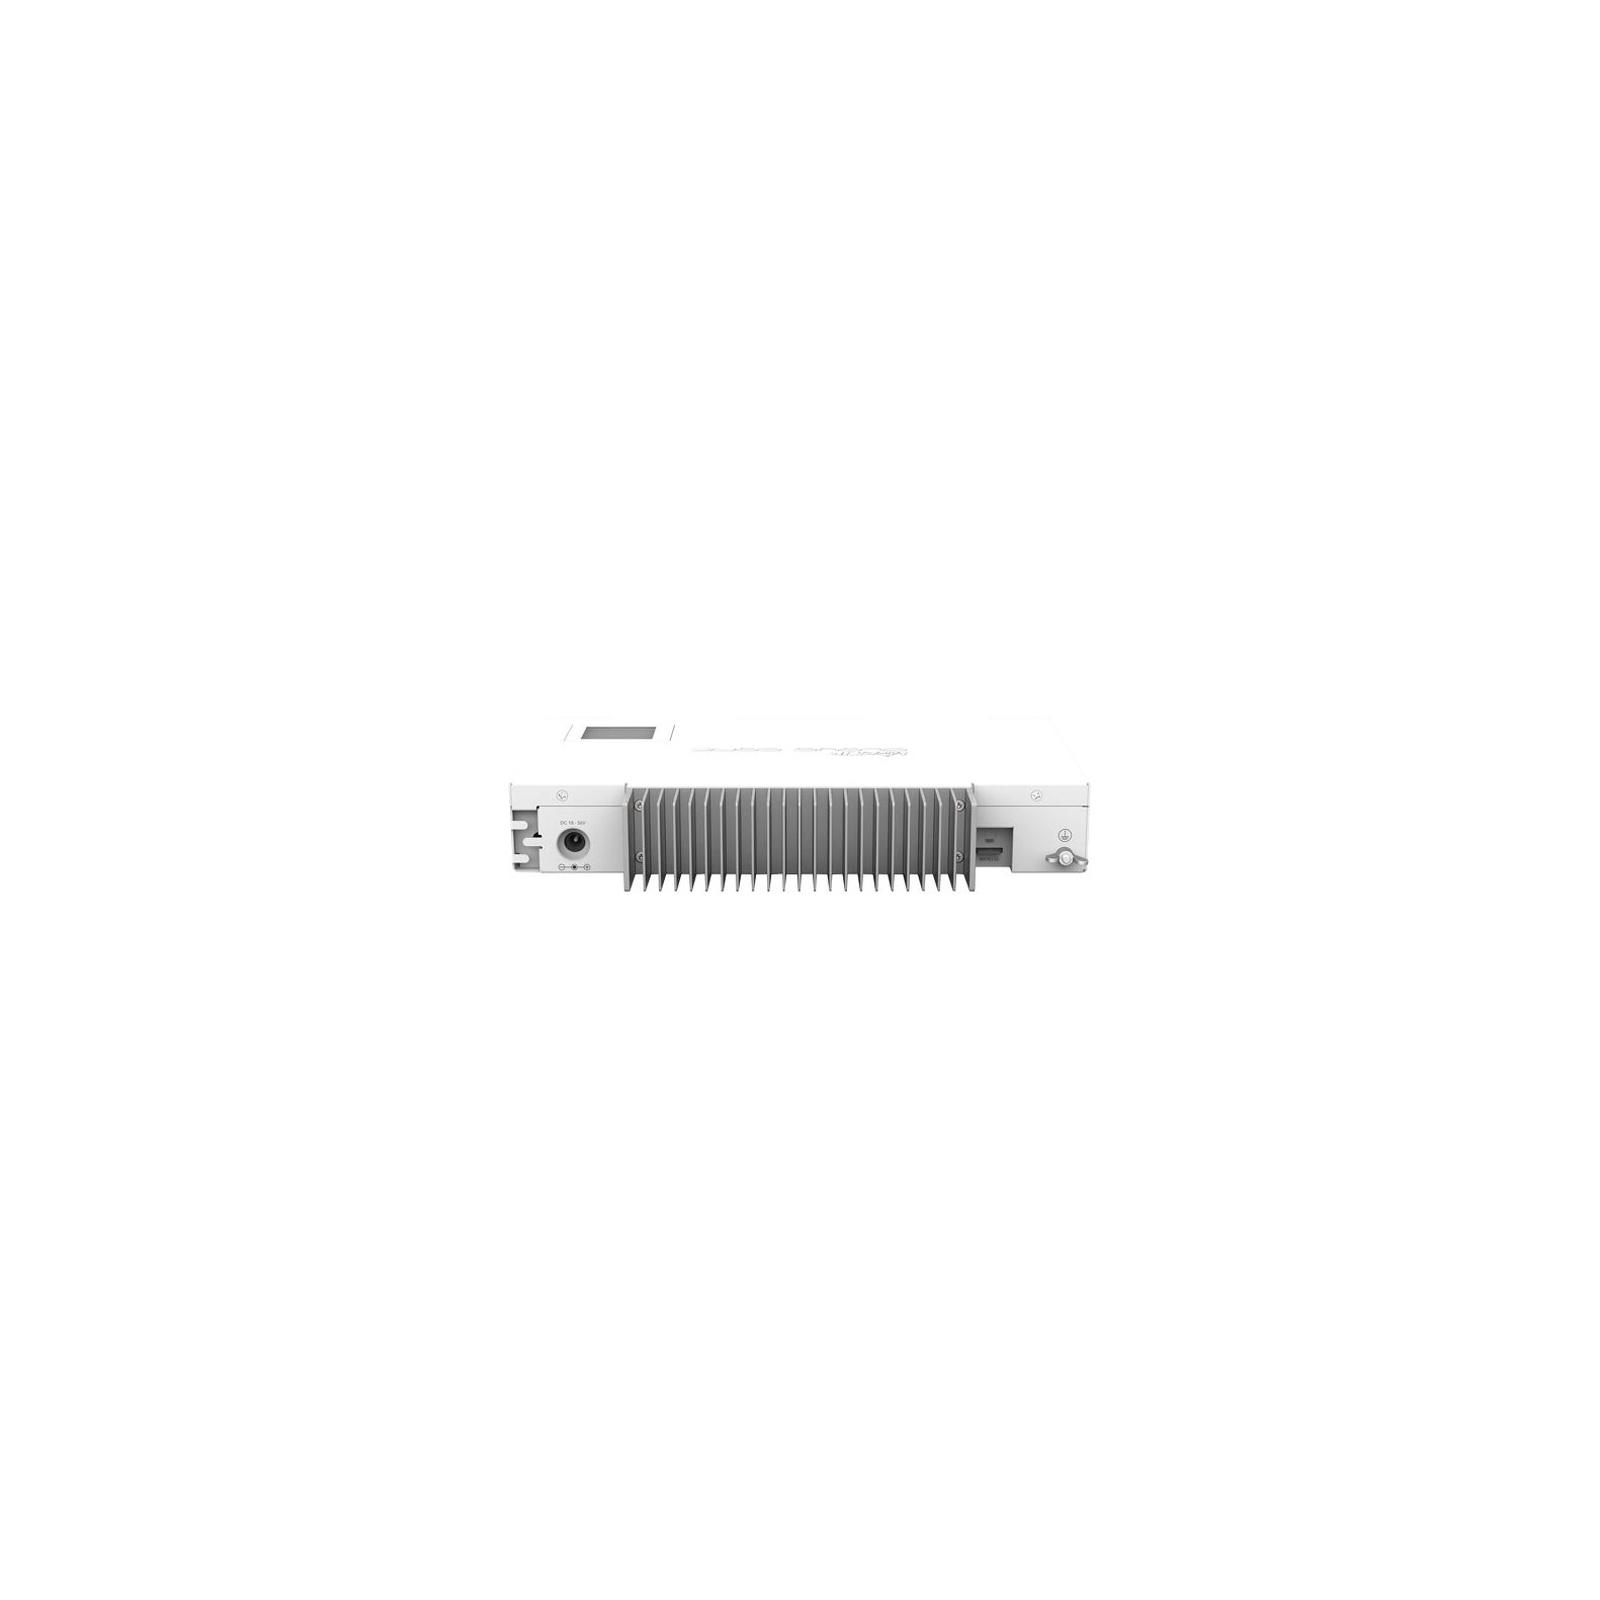 Маршрутизатор Mikrotik CCR1009-8G-1S-1S+PC изображение 2